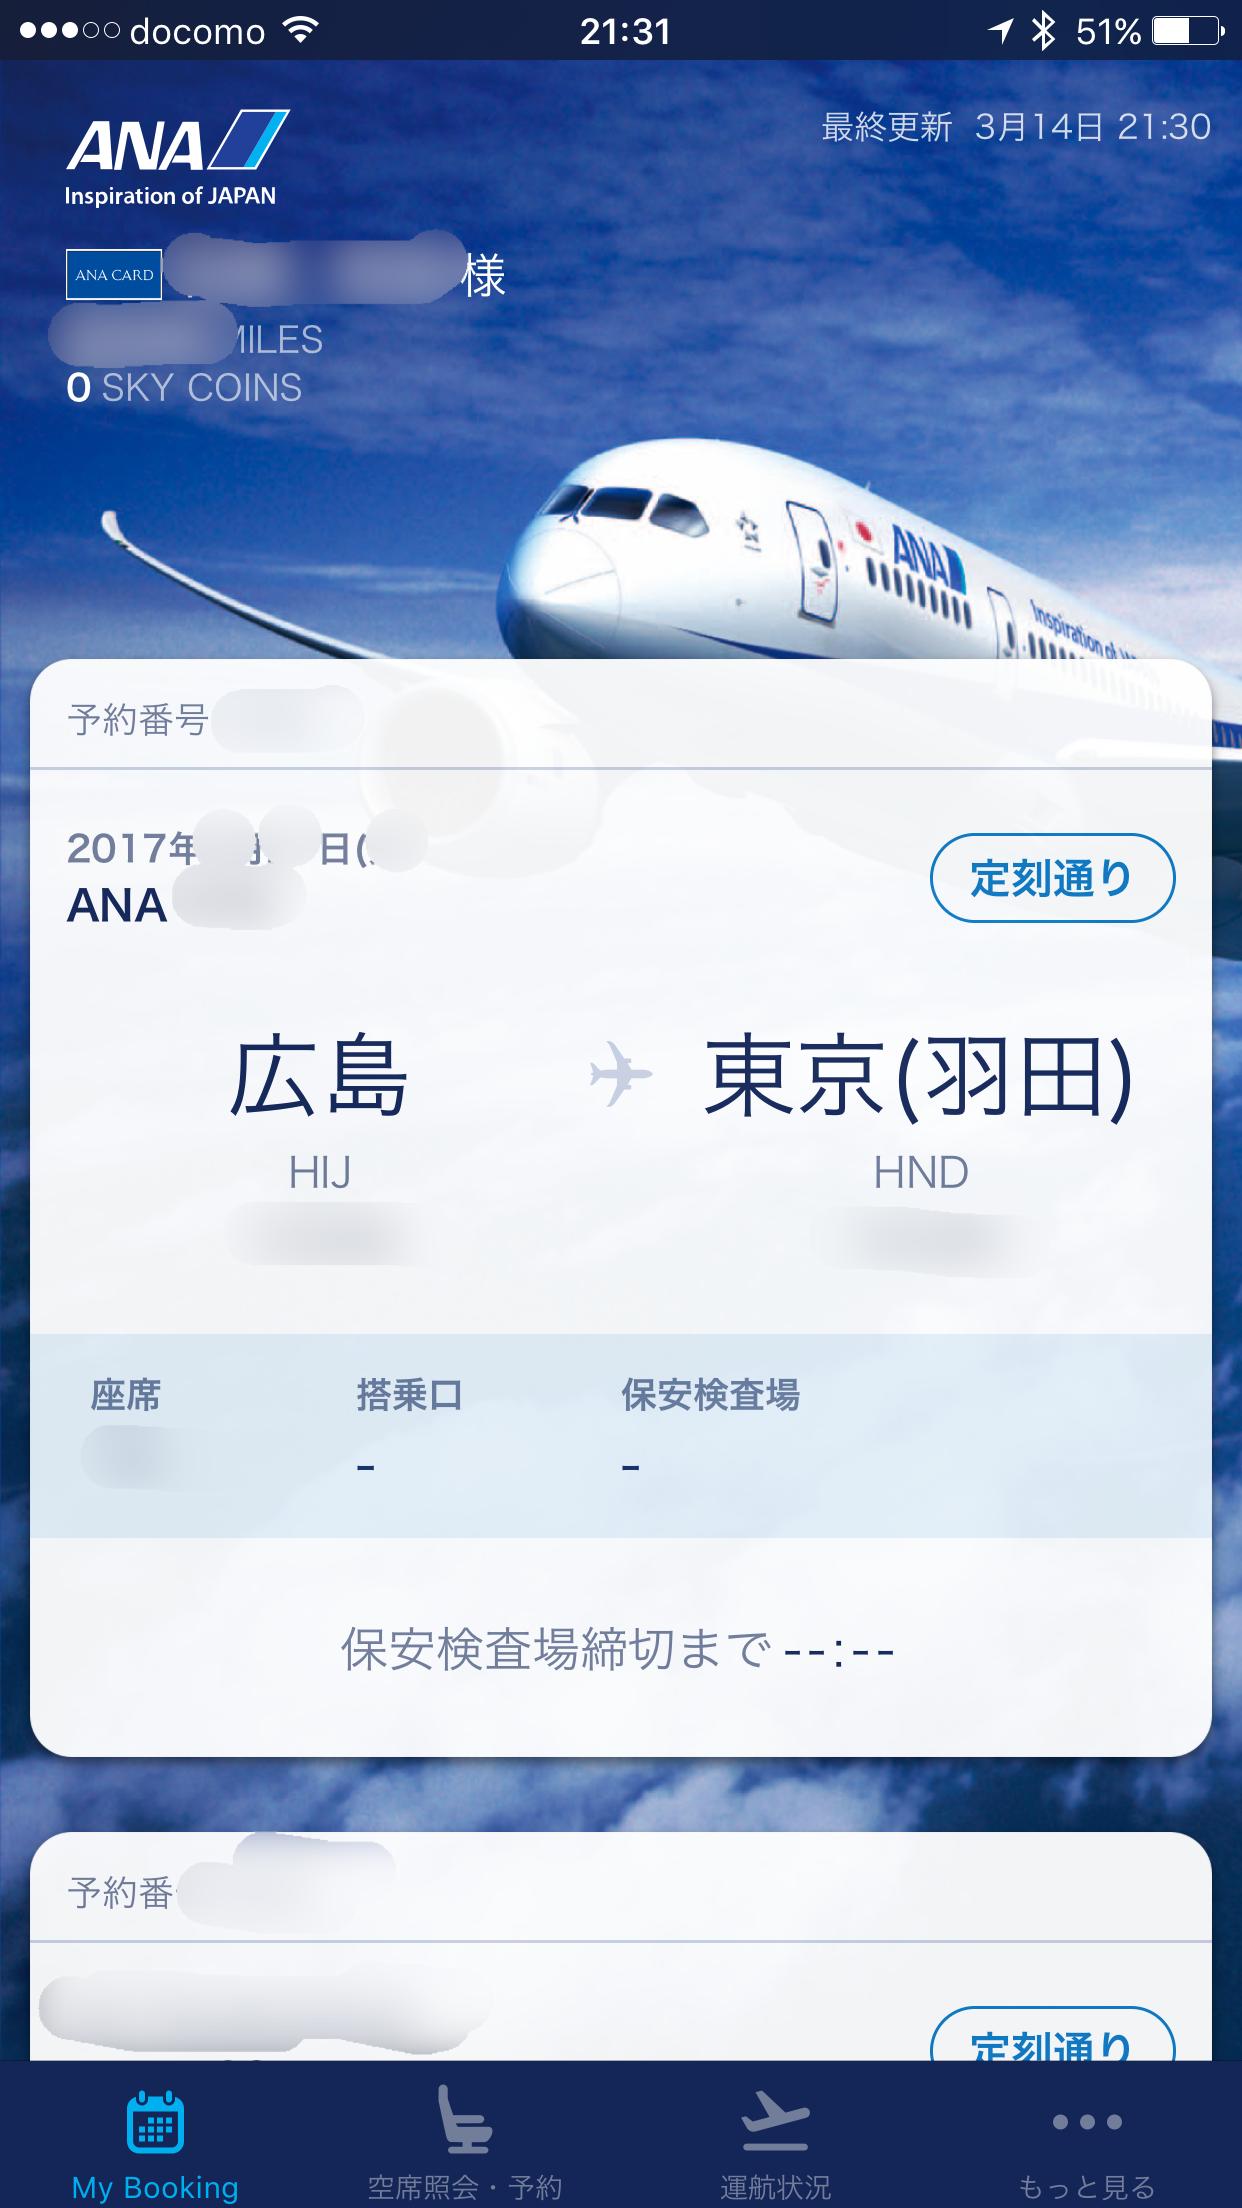 ANAが「ANAアプリ」を更新しデザイン刷新。しかし、搭乗券をApple PayのPass(Wallet)に登録不可能…(更新:登録できるようになりました)